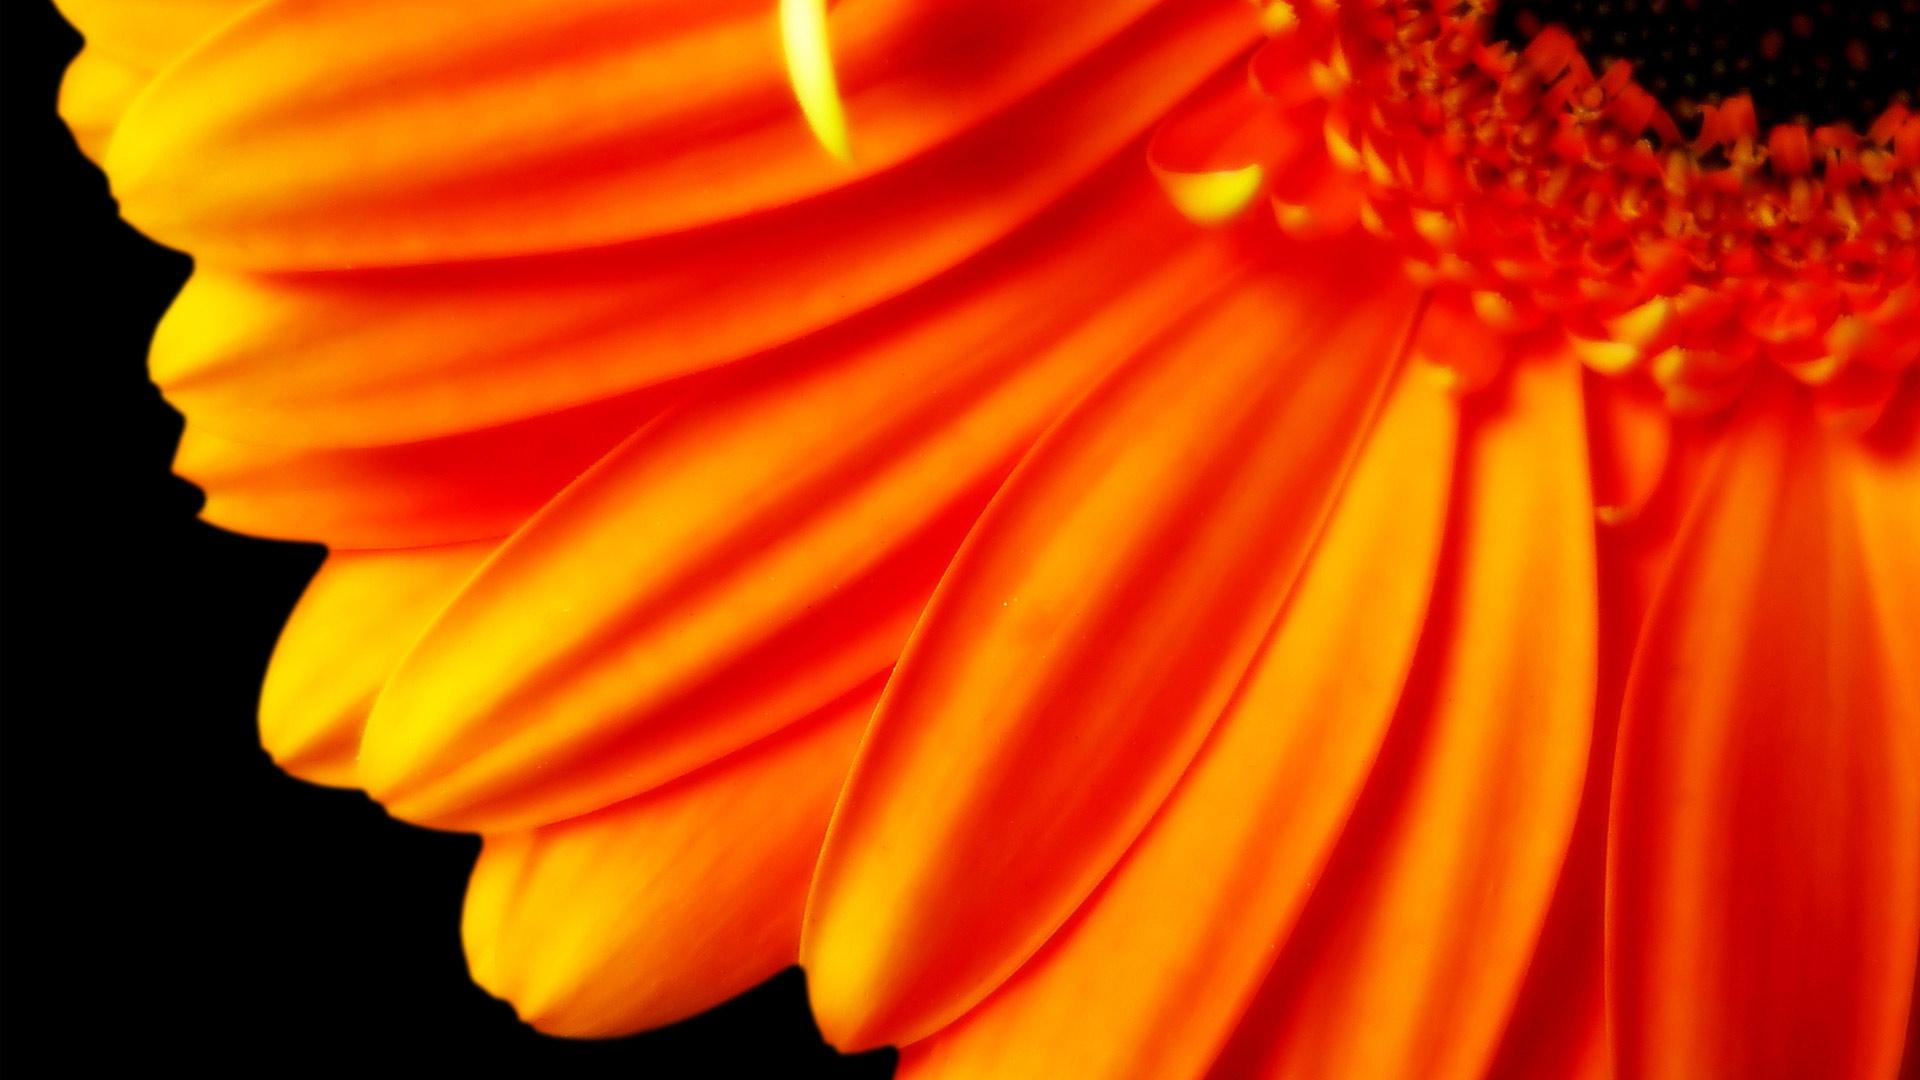 HD Wallpapers Pure Orange Flower 1080p